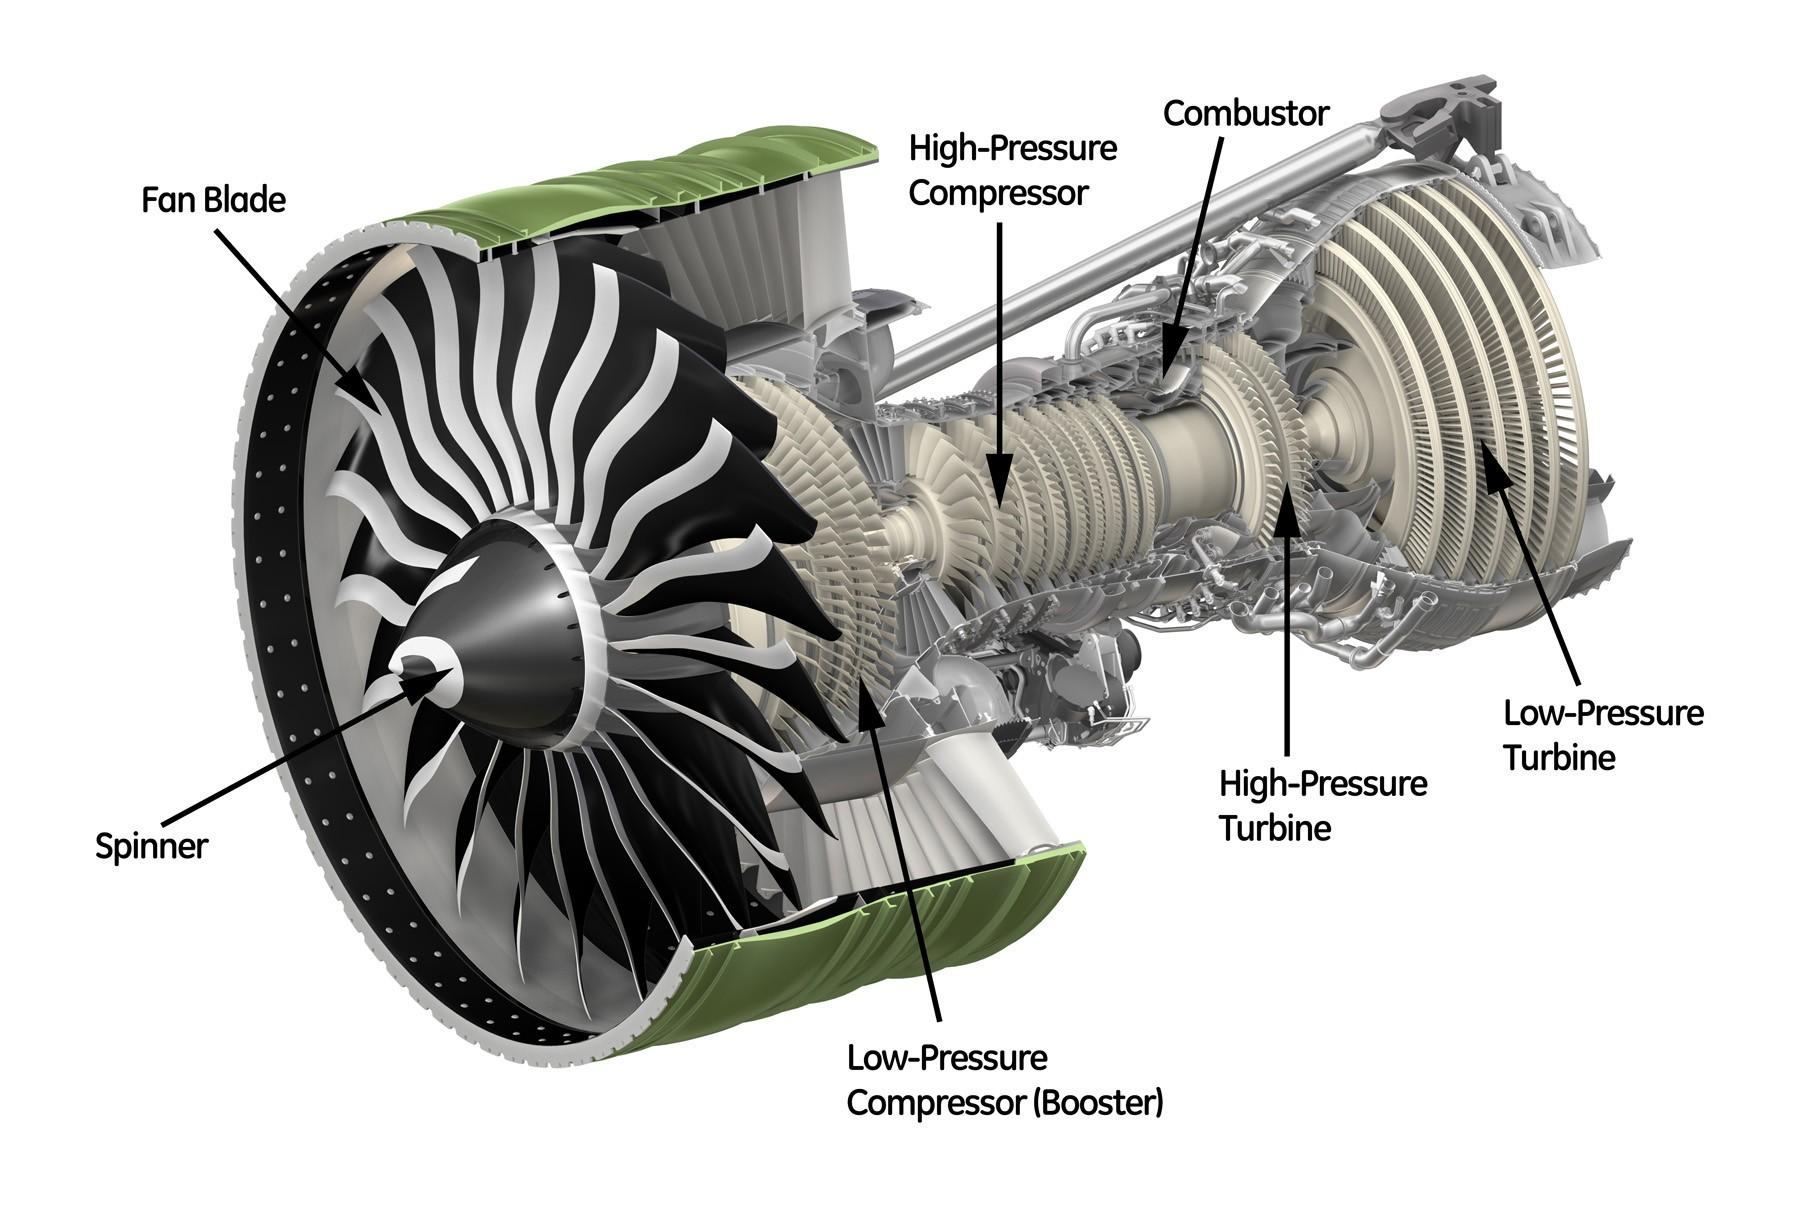 Jet Engine Parts Diagram 516—318 Ge 90 Of Jet Engine Parts Diagram